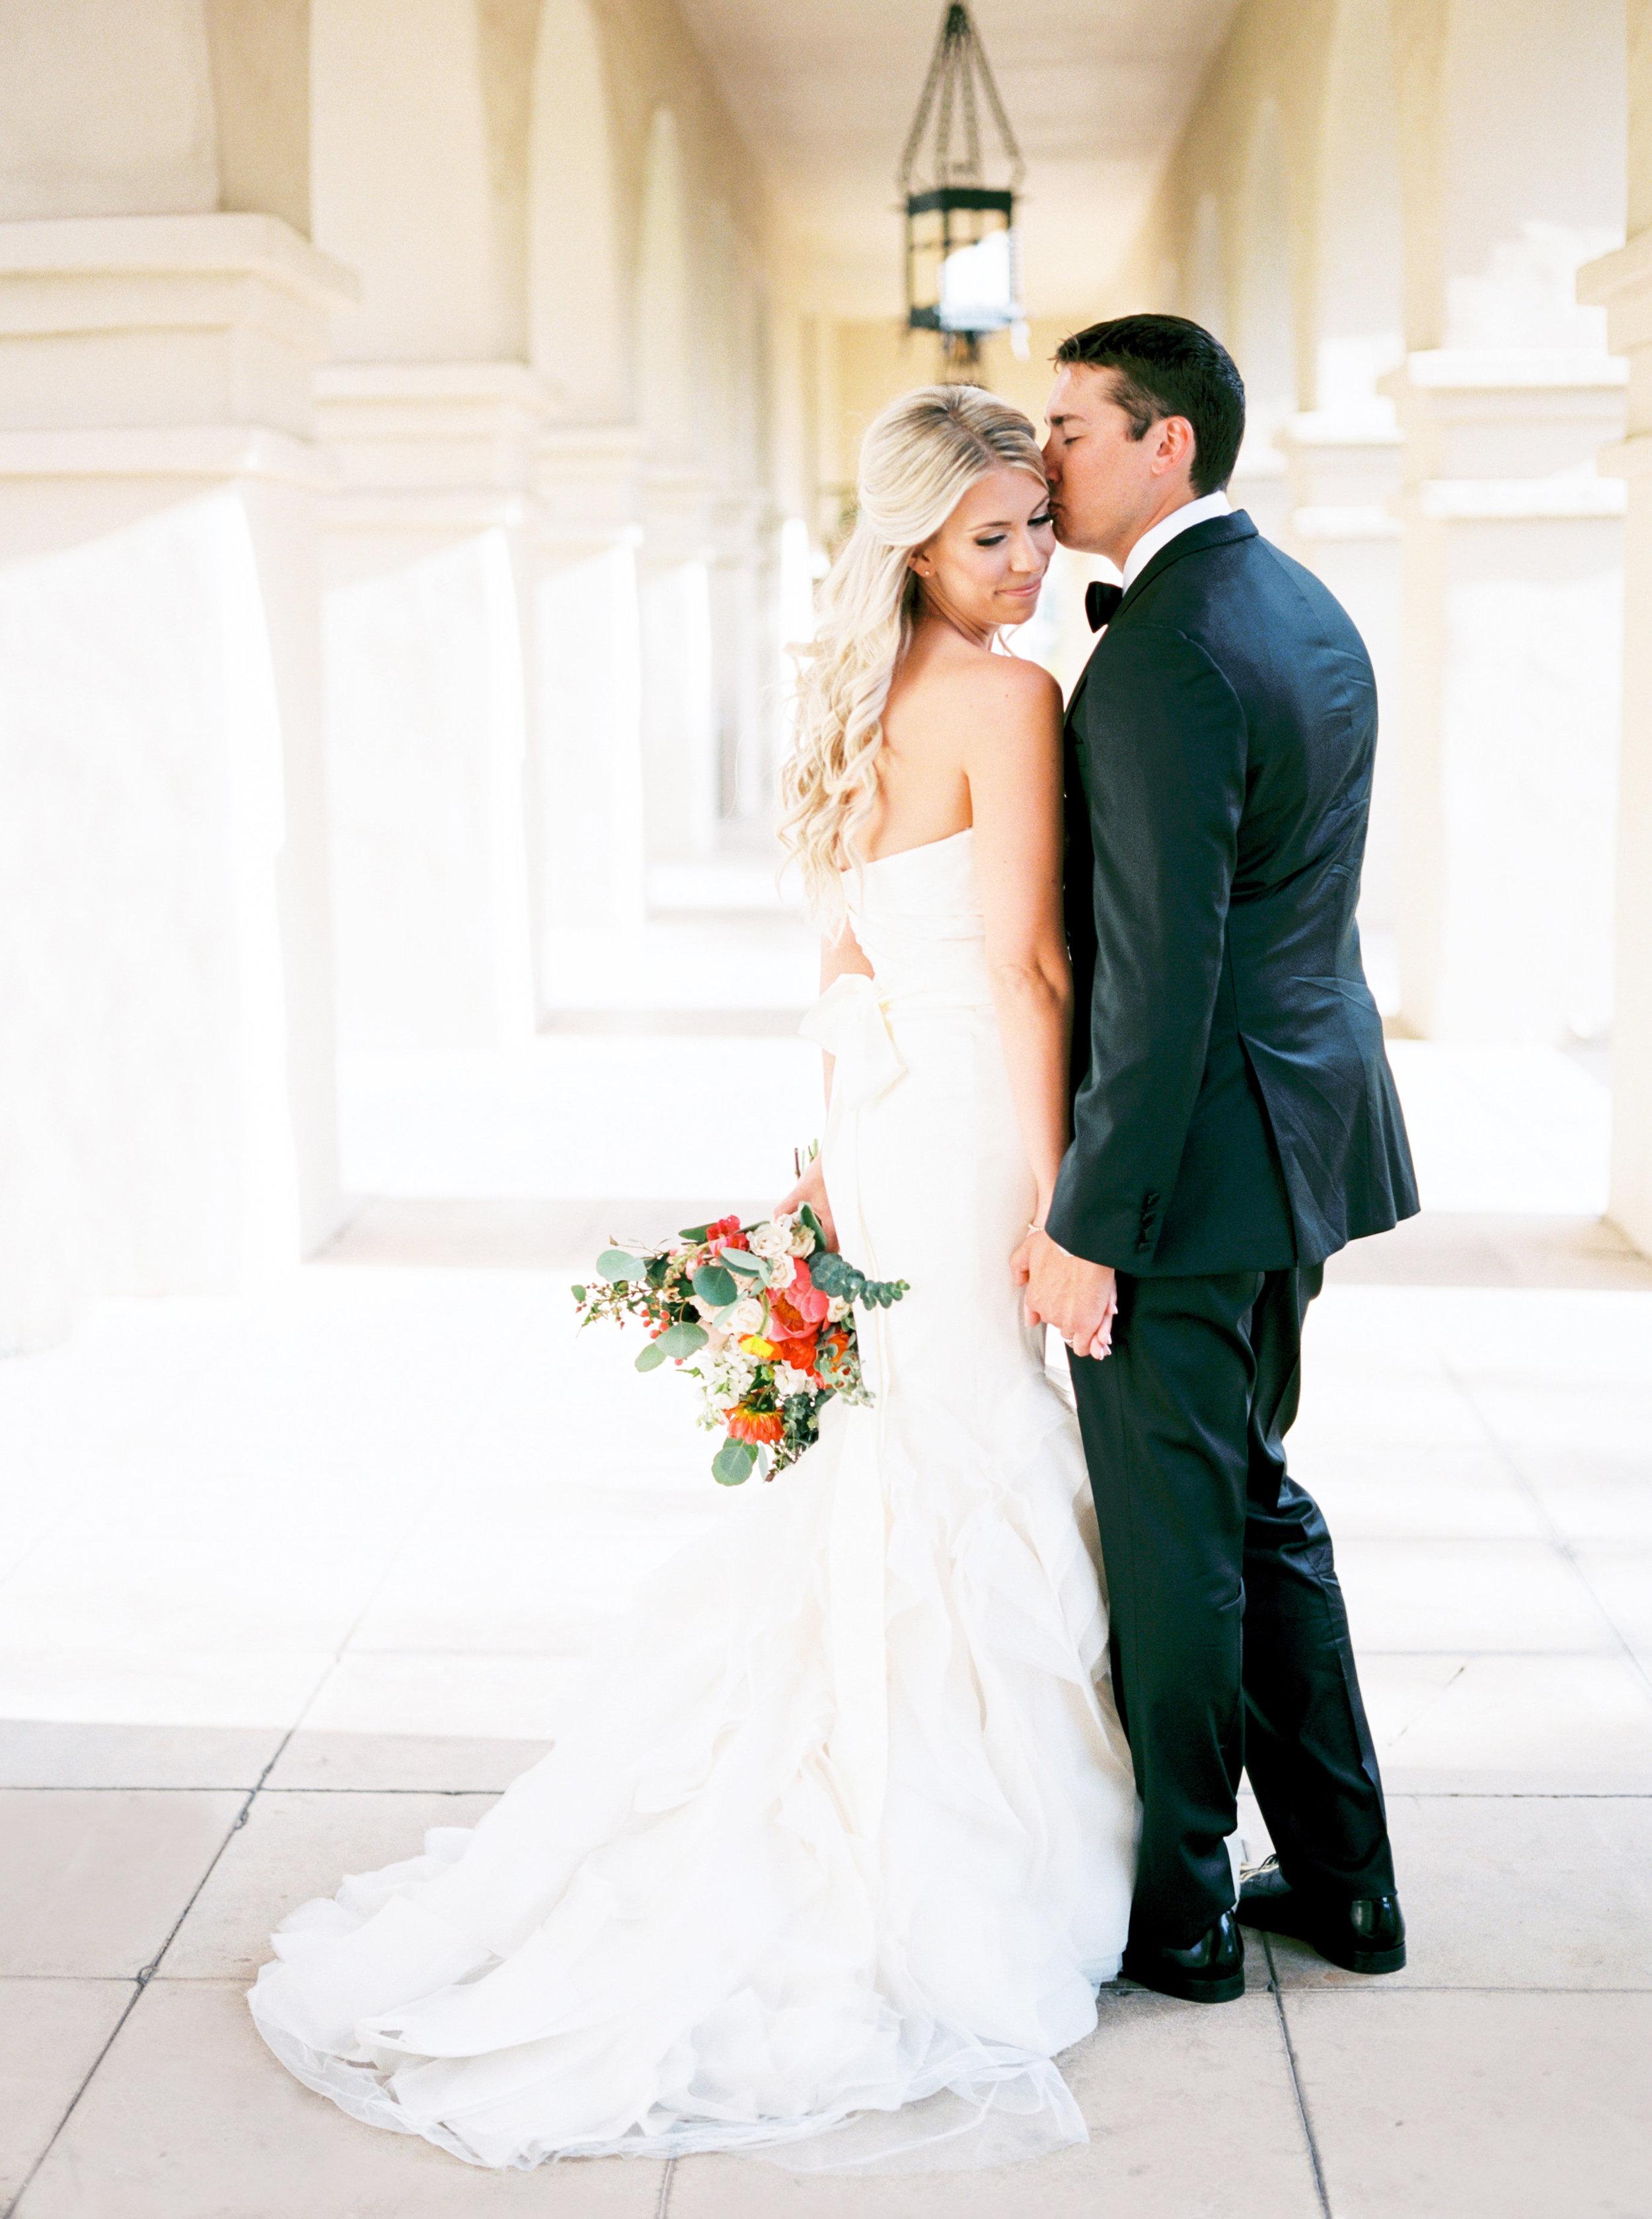 Scottsdale-wedding-planner-0072.jpg